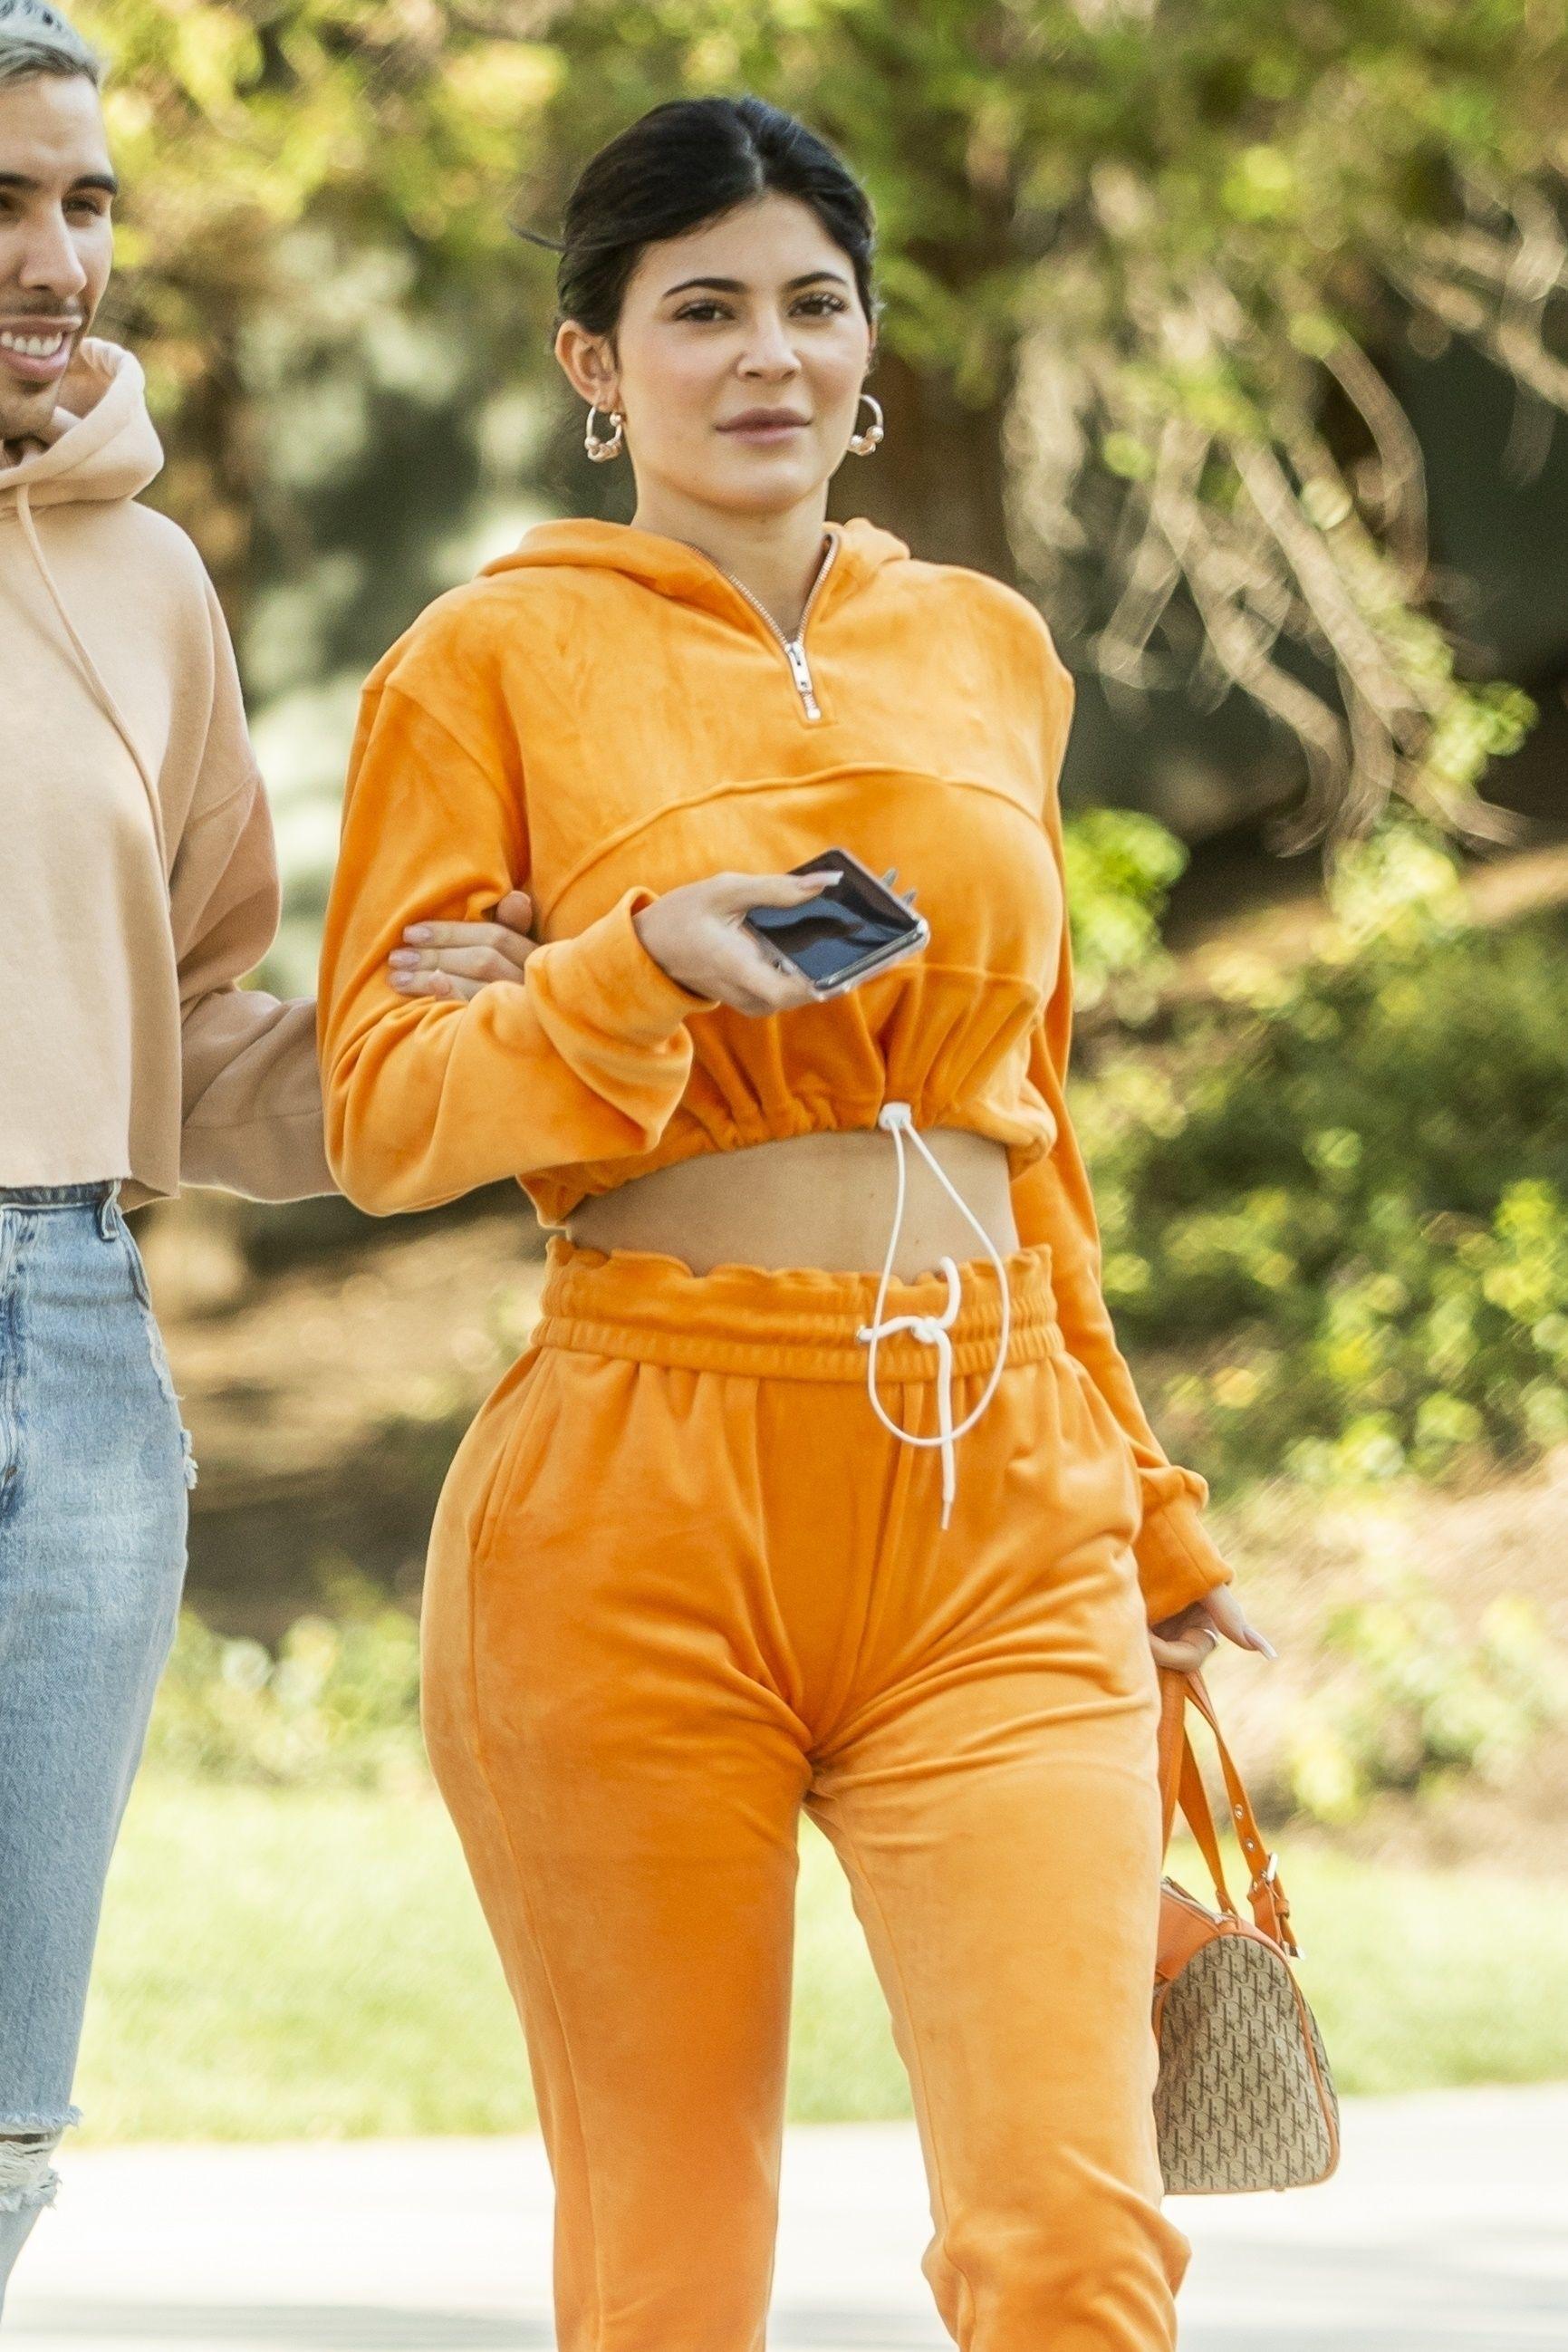 Kylie Jenner  no makeup ile ilgili görsel sonucu